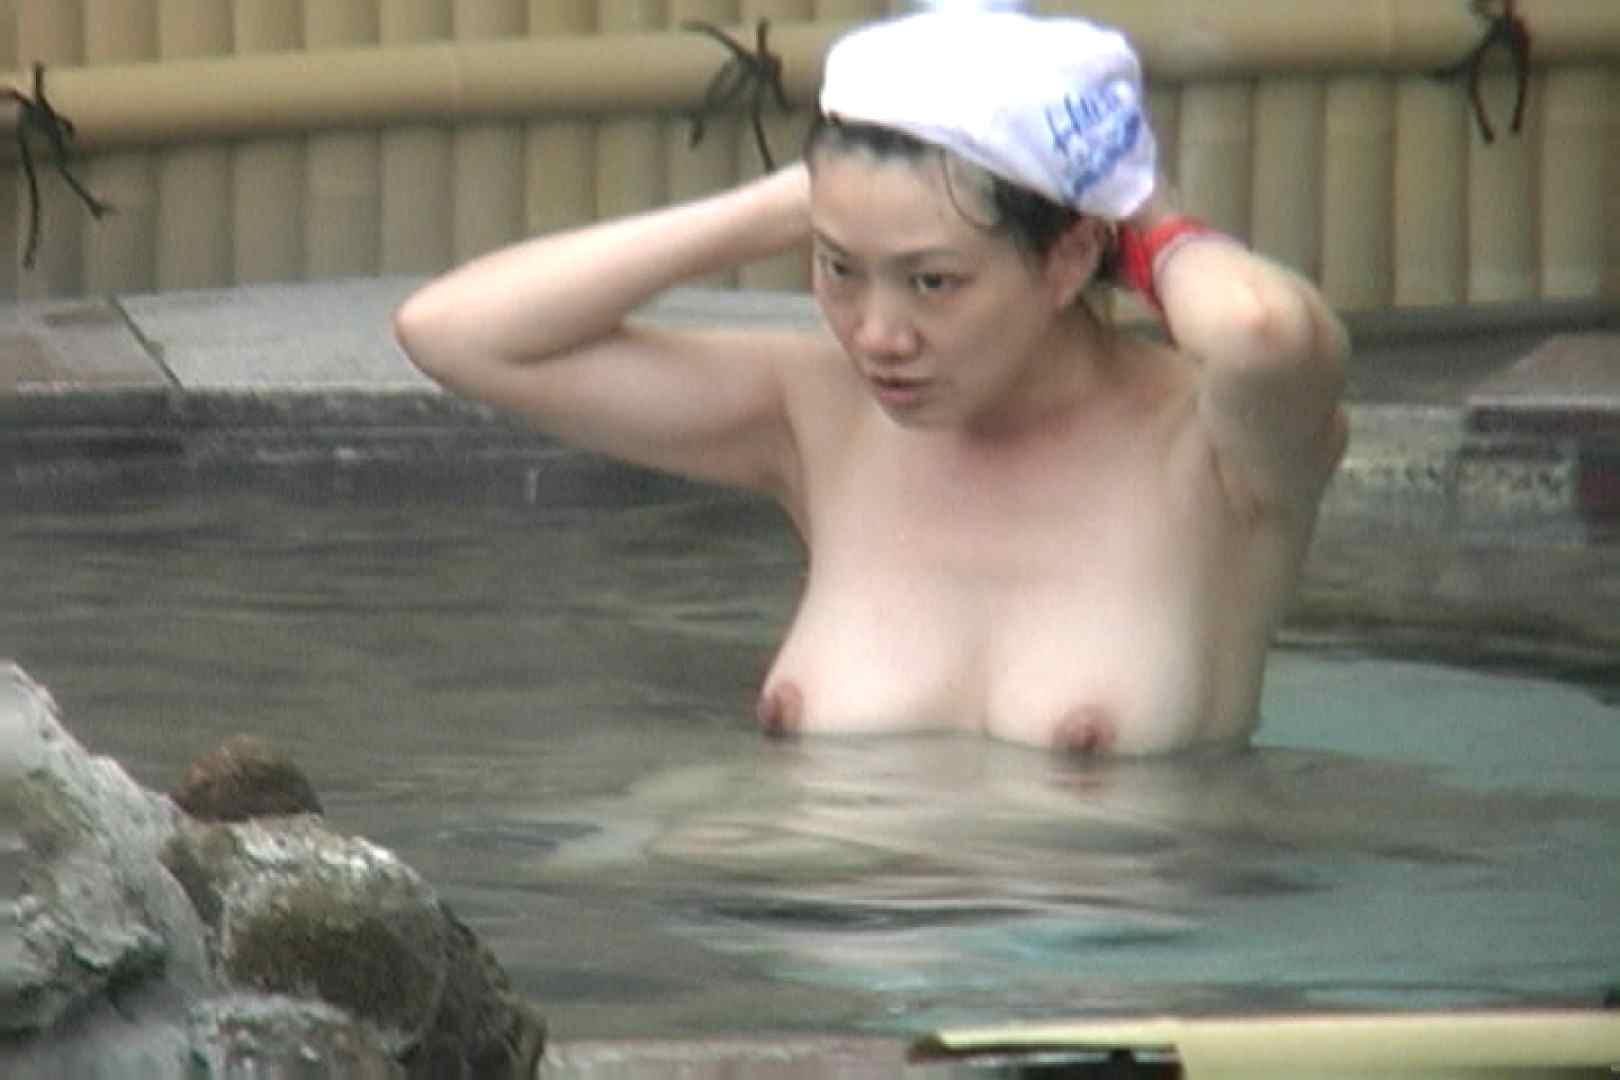 Aquaな露天風呂Vol.547 盗撮 エロ無料画像 100枚 83